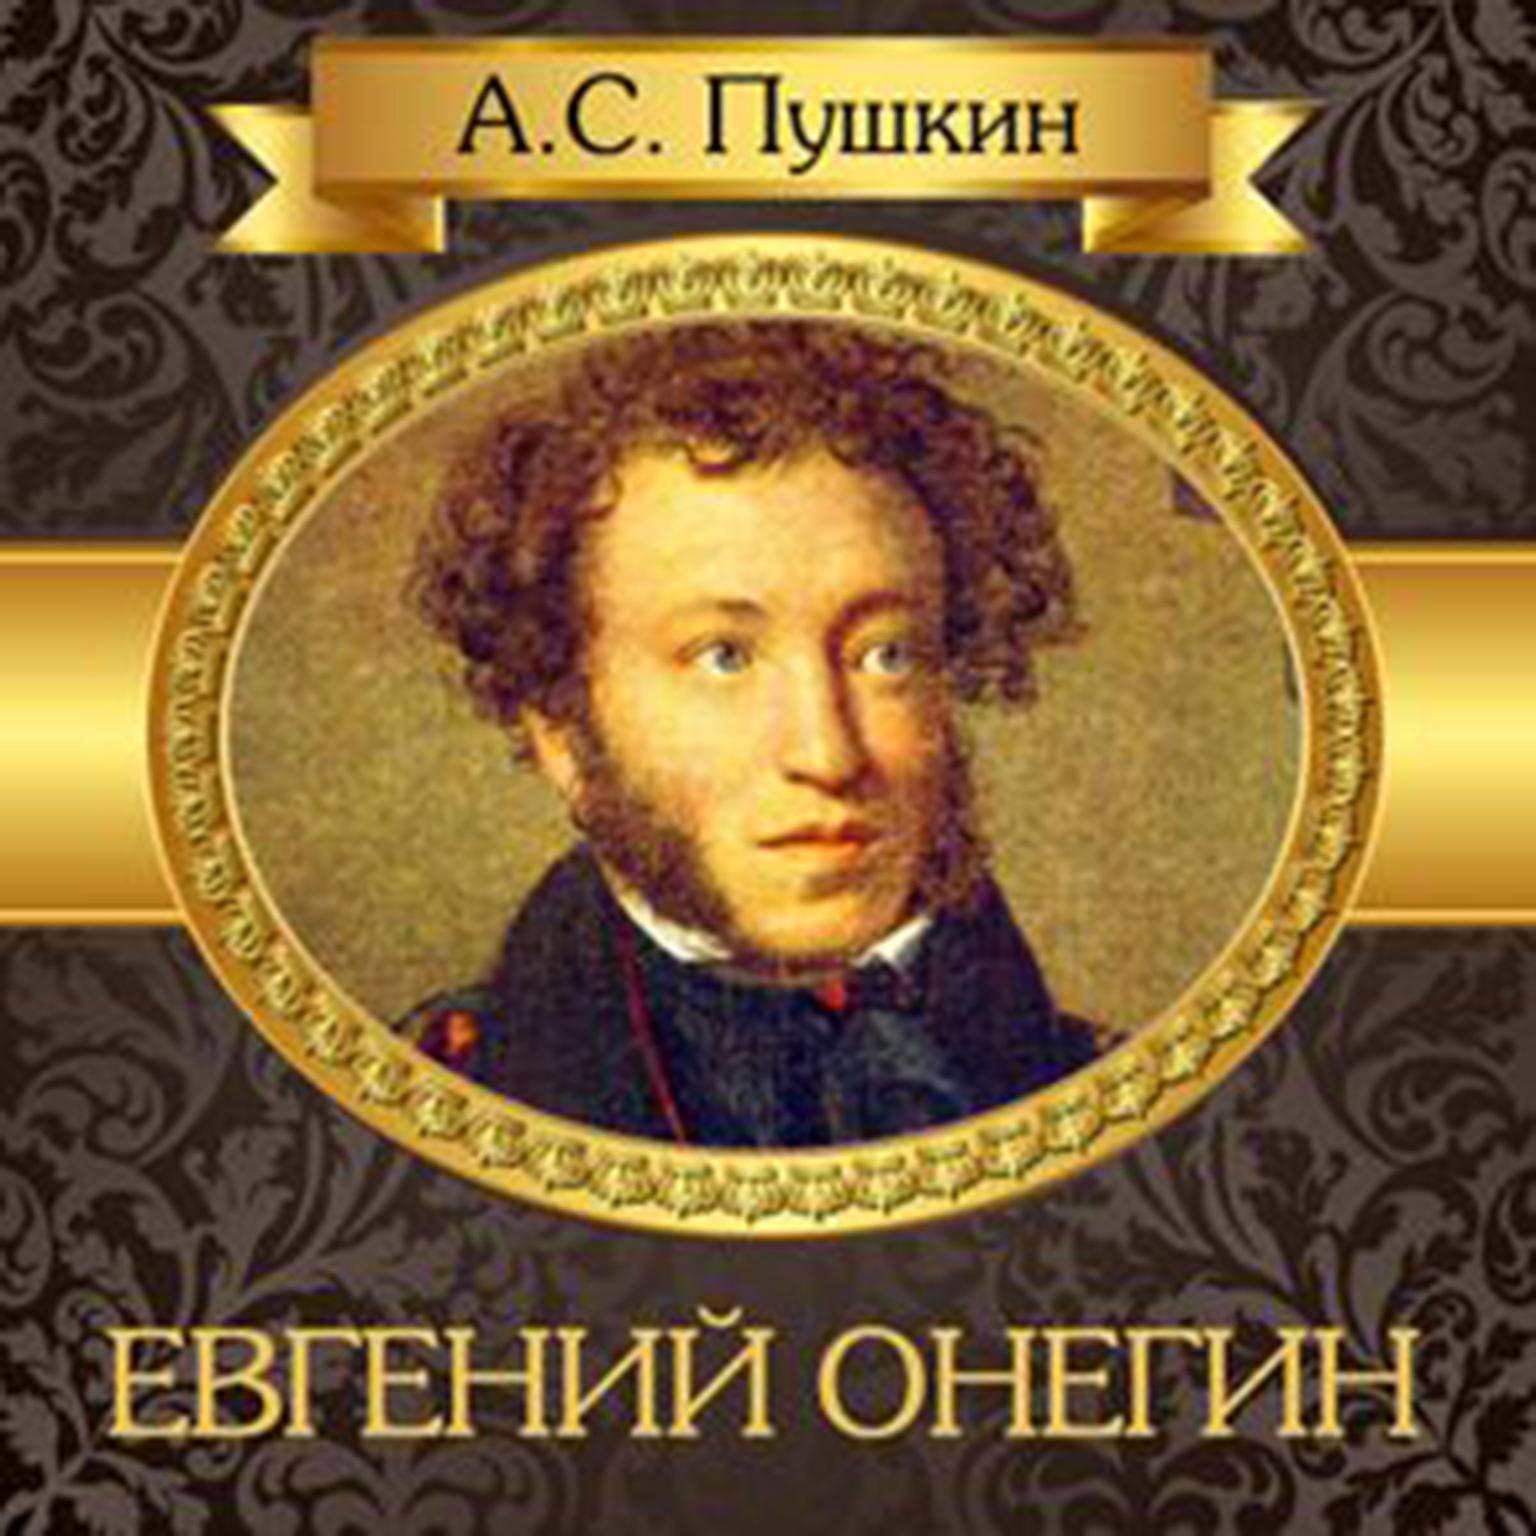 Eugene Onegin [Russian Edition] Audiobook, by Alexander Pushkin